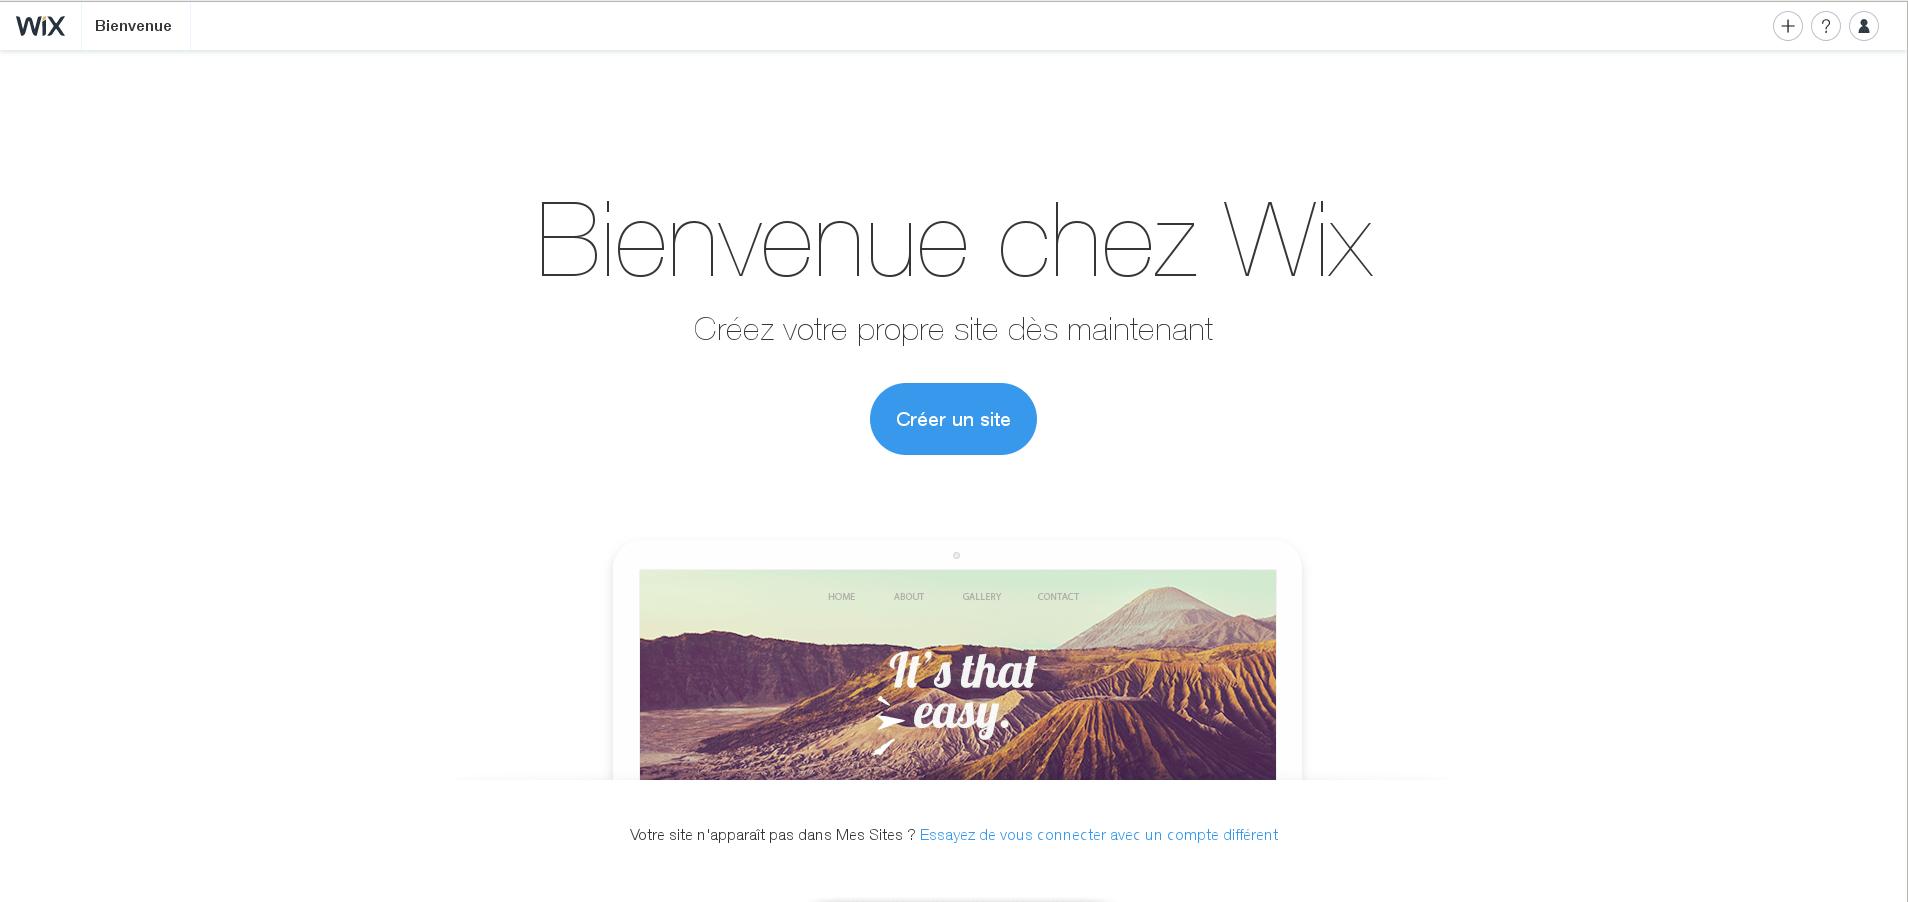 Aperçu du site du logiciel Wix